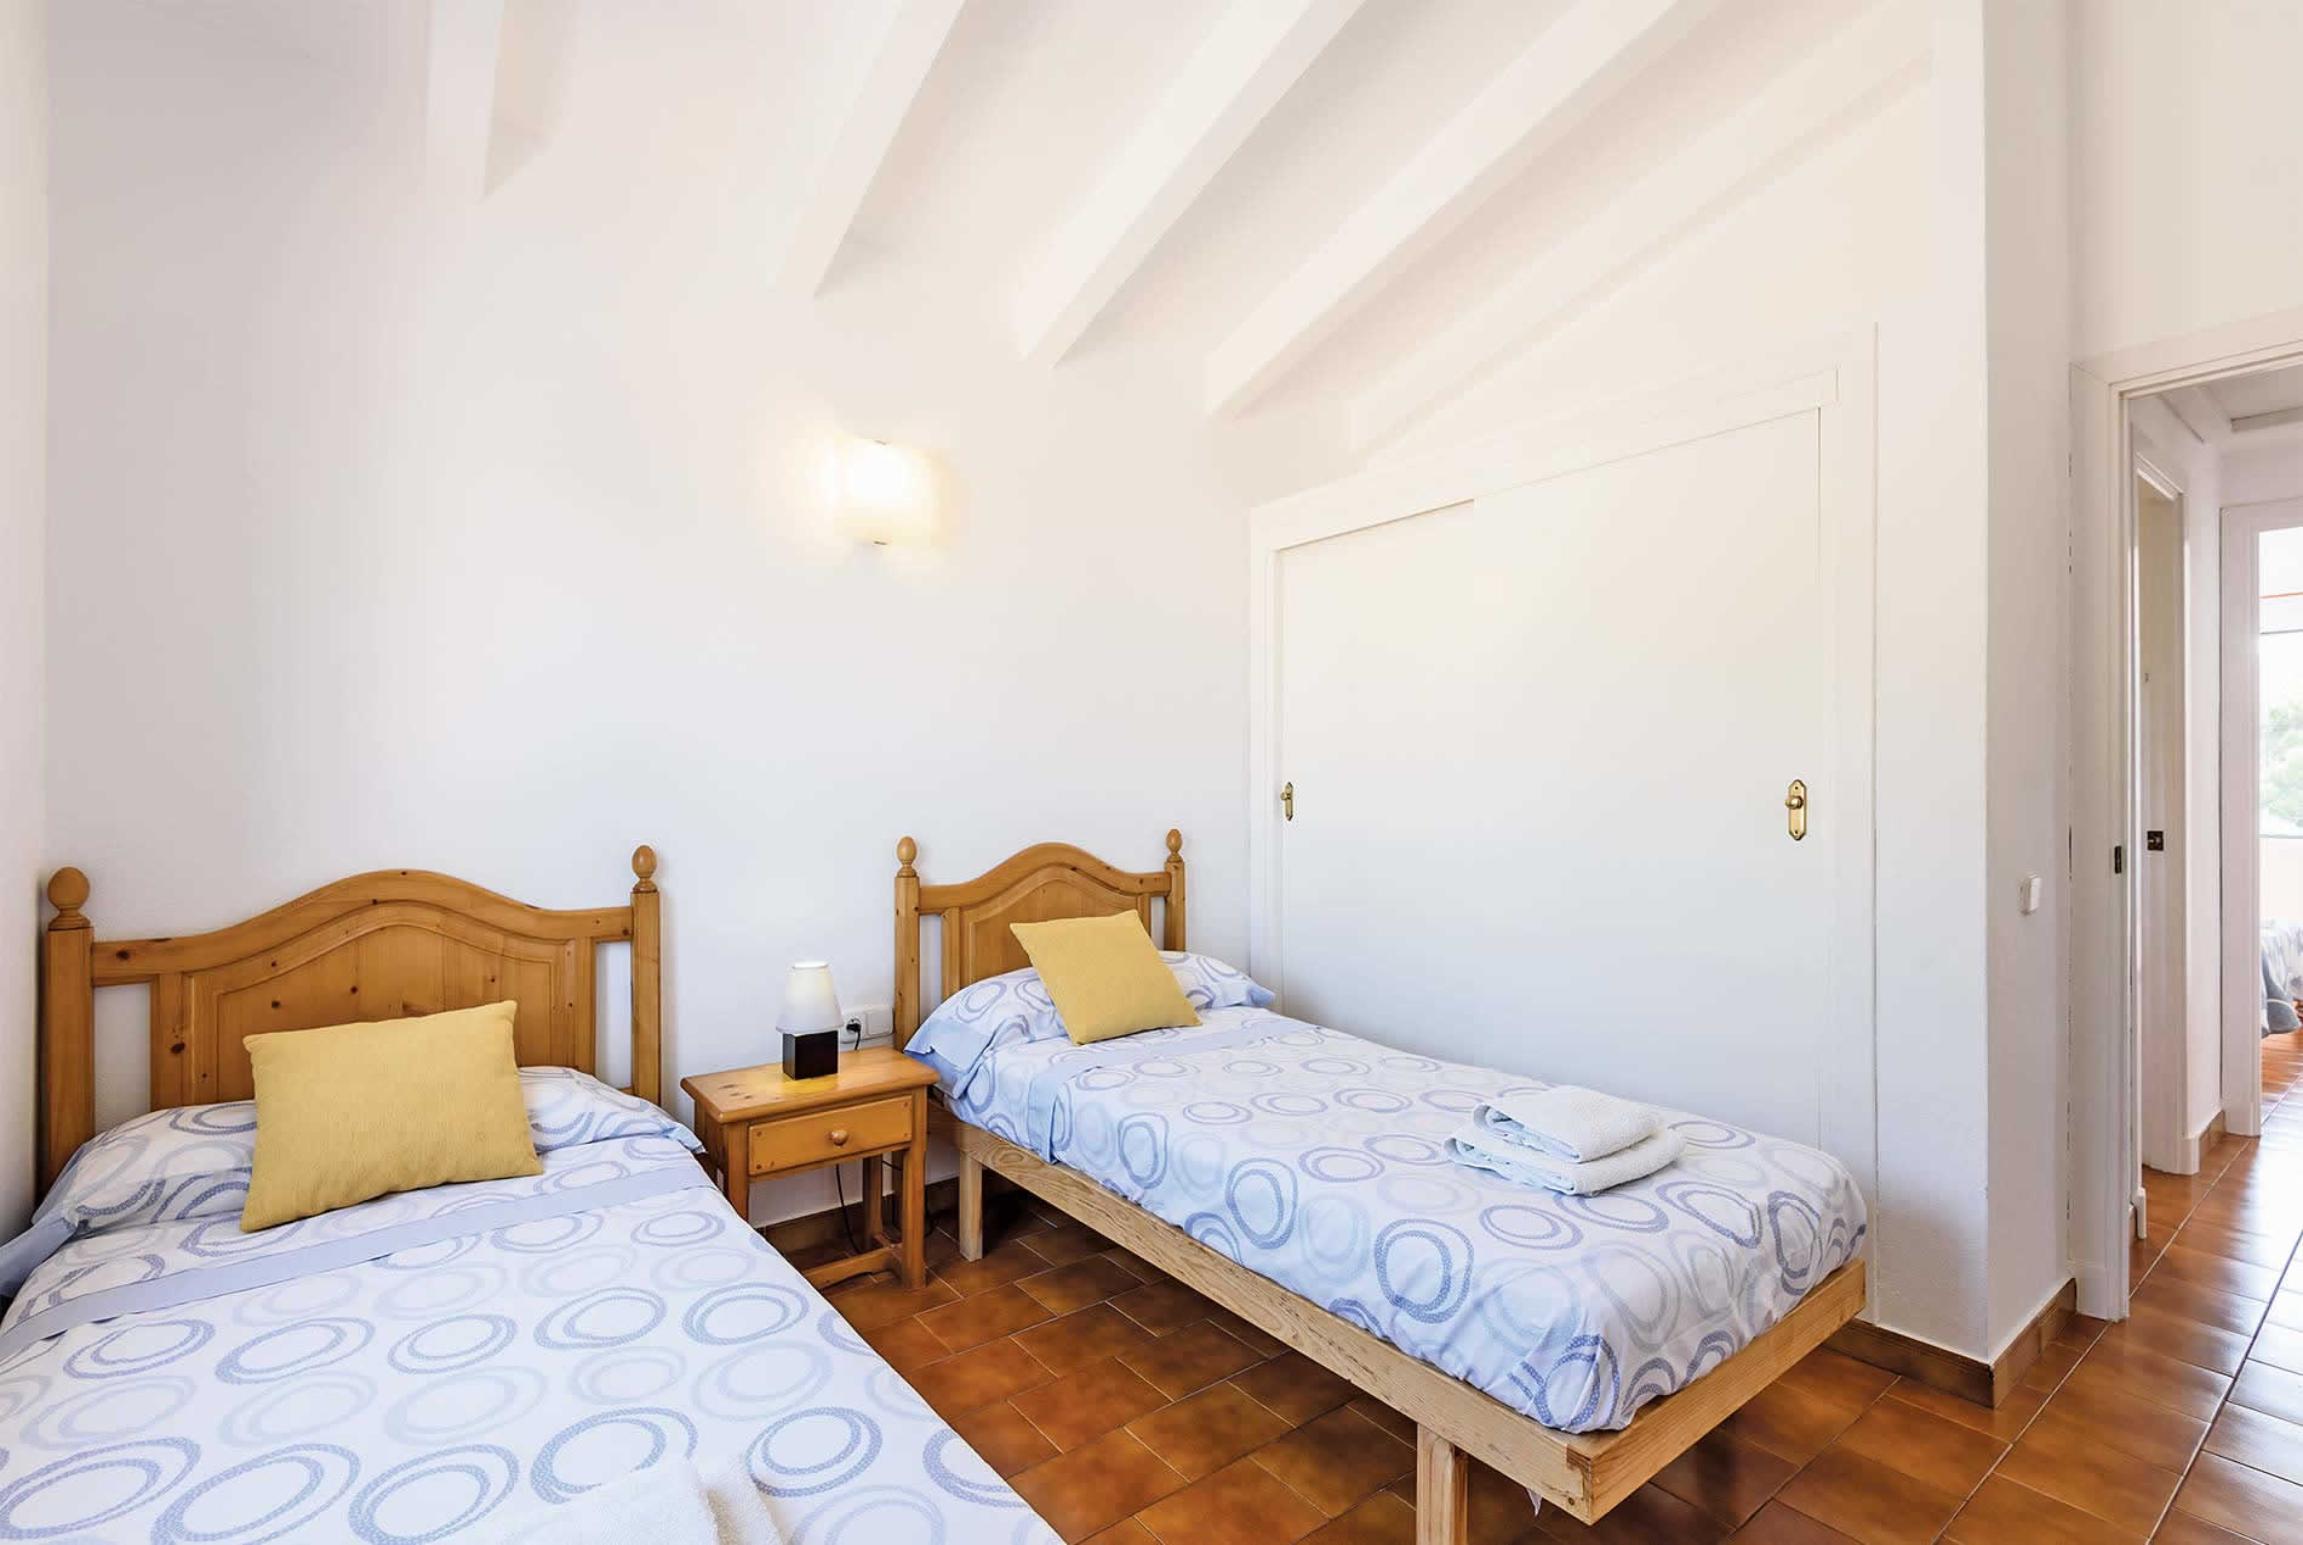 Ferienhaus Eulalia II (2653368), Arenal De'N Castell, Menorca, Balearische Inseln, Spanien, Bild 7